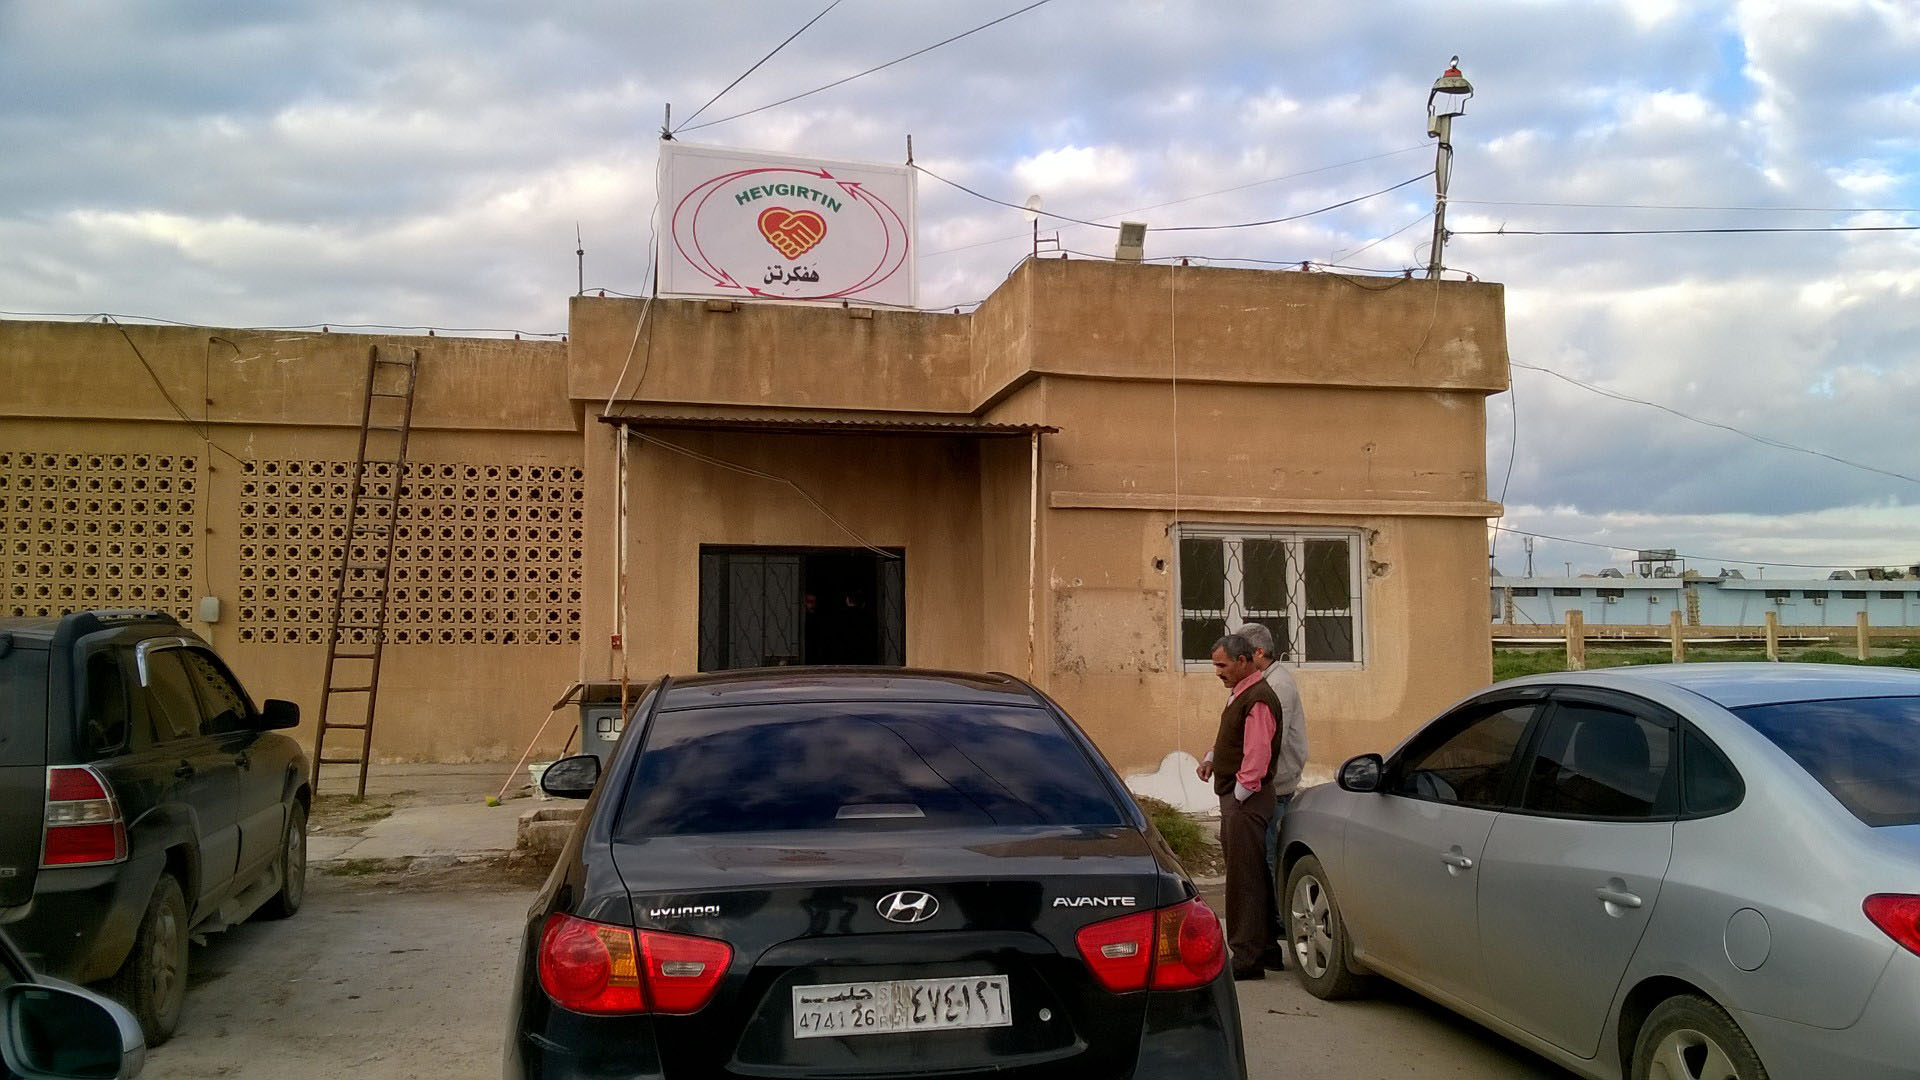 Kurdistan, Rojava, Syria, Cizire, co-operatives, cooperatives, co-operative, cooperative, co-op, co-ops, solidarity, solidarity economy, workers co-op, workers co-operative, workers cooperative, cooperative economy, solidarity economy, Hevgirtin